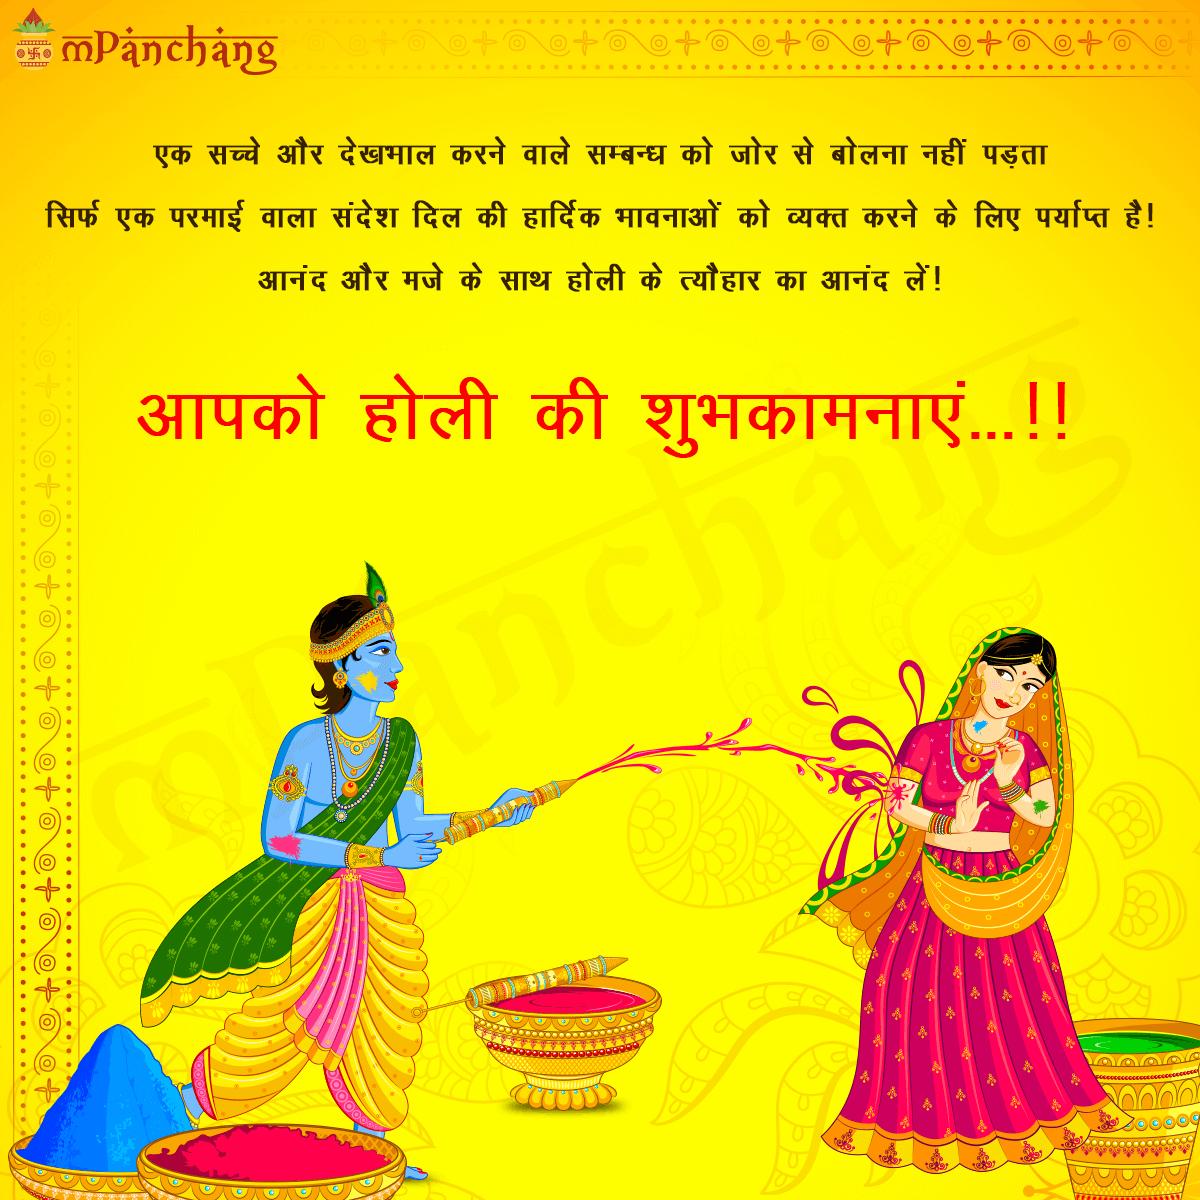 happy holi greetings image